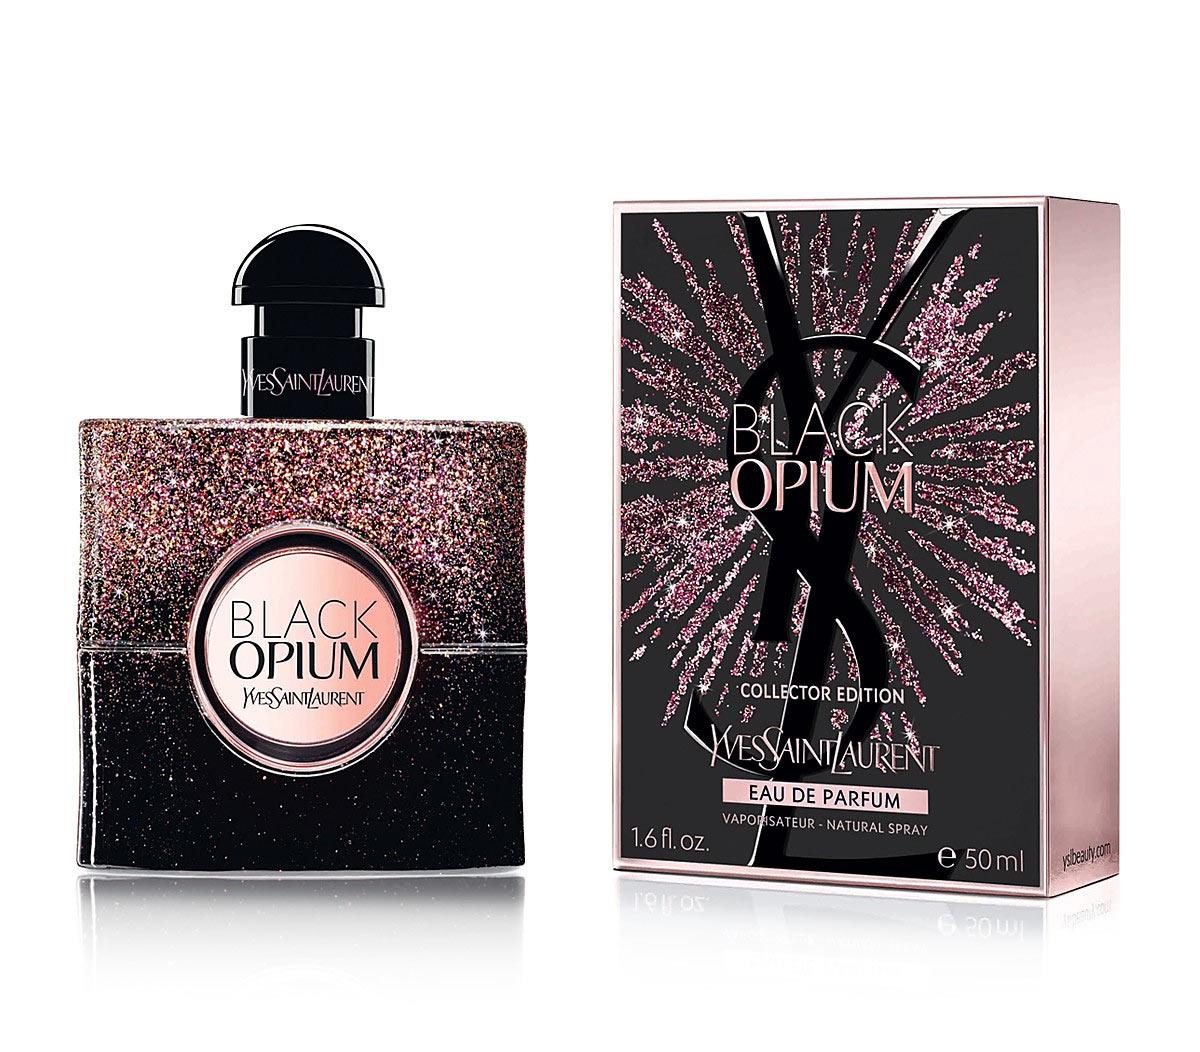 0b12500cc79 Thread: NEW: Yves Saint Laurent - Black Opium Firework Collection Edition  For Women!